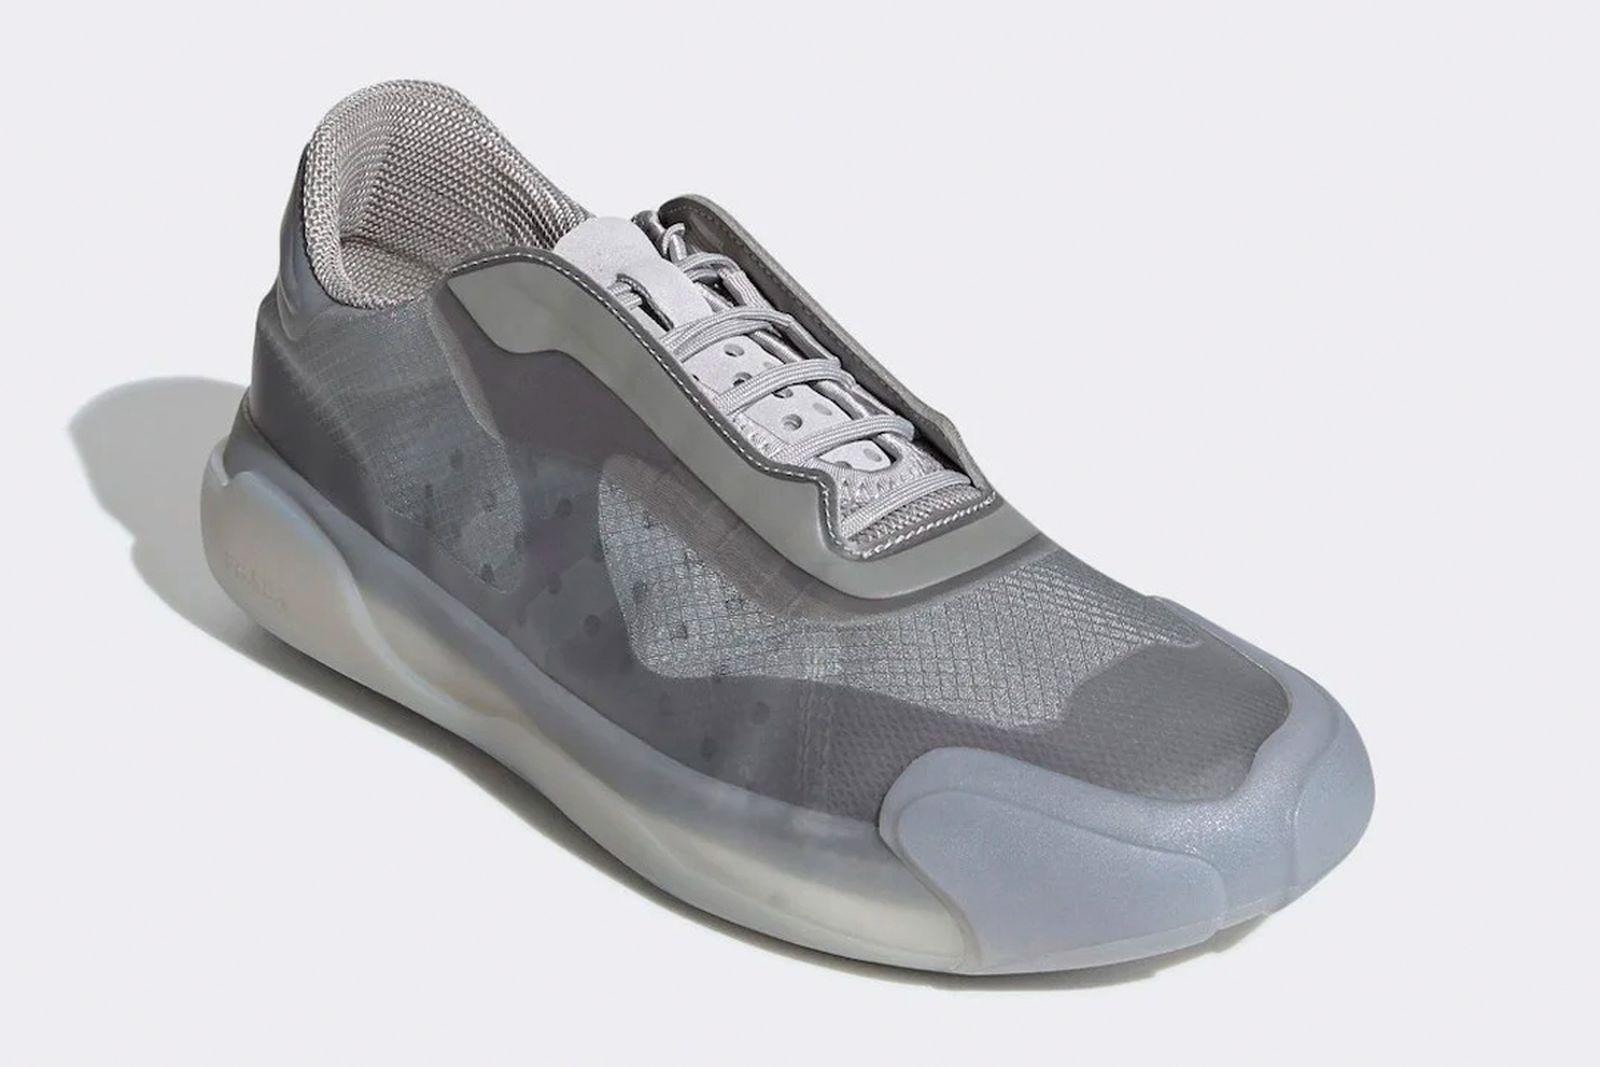 prada-adidas-luna-rossa-21-silver-release-date-price-03